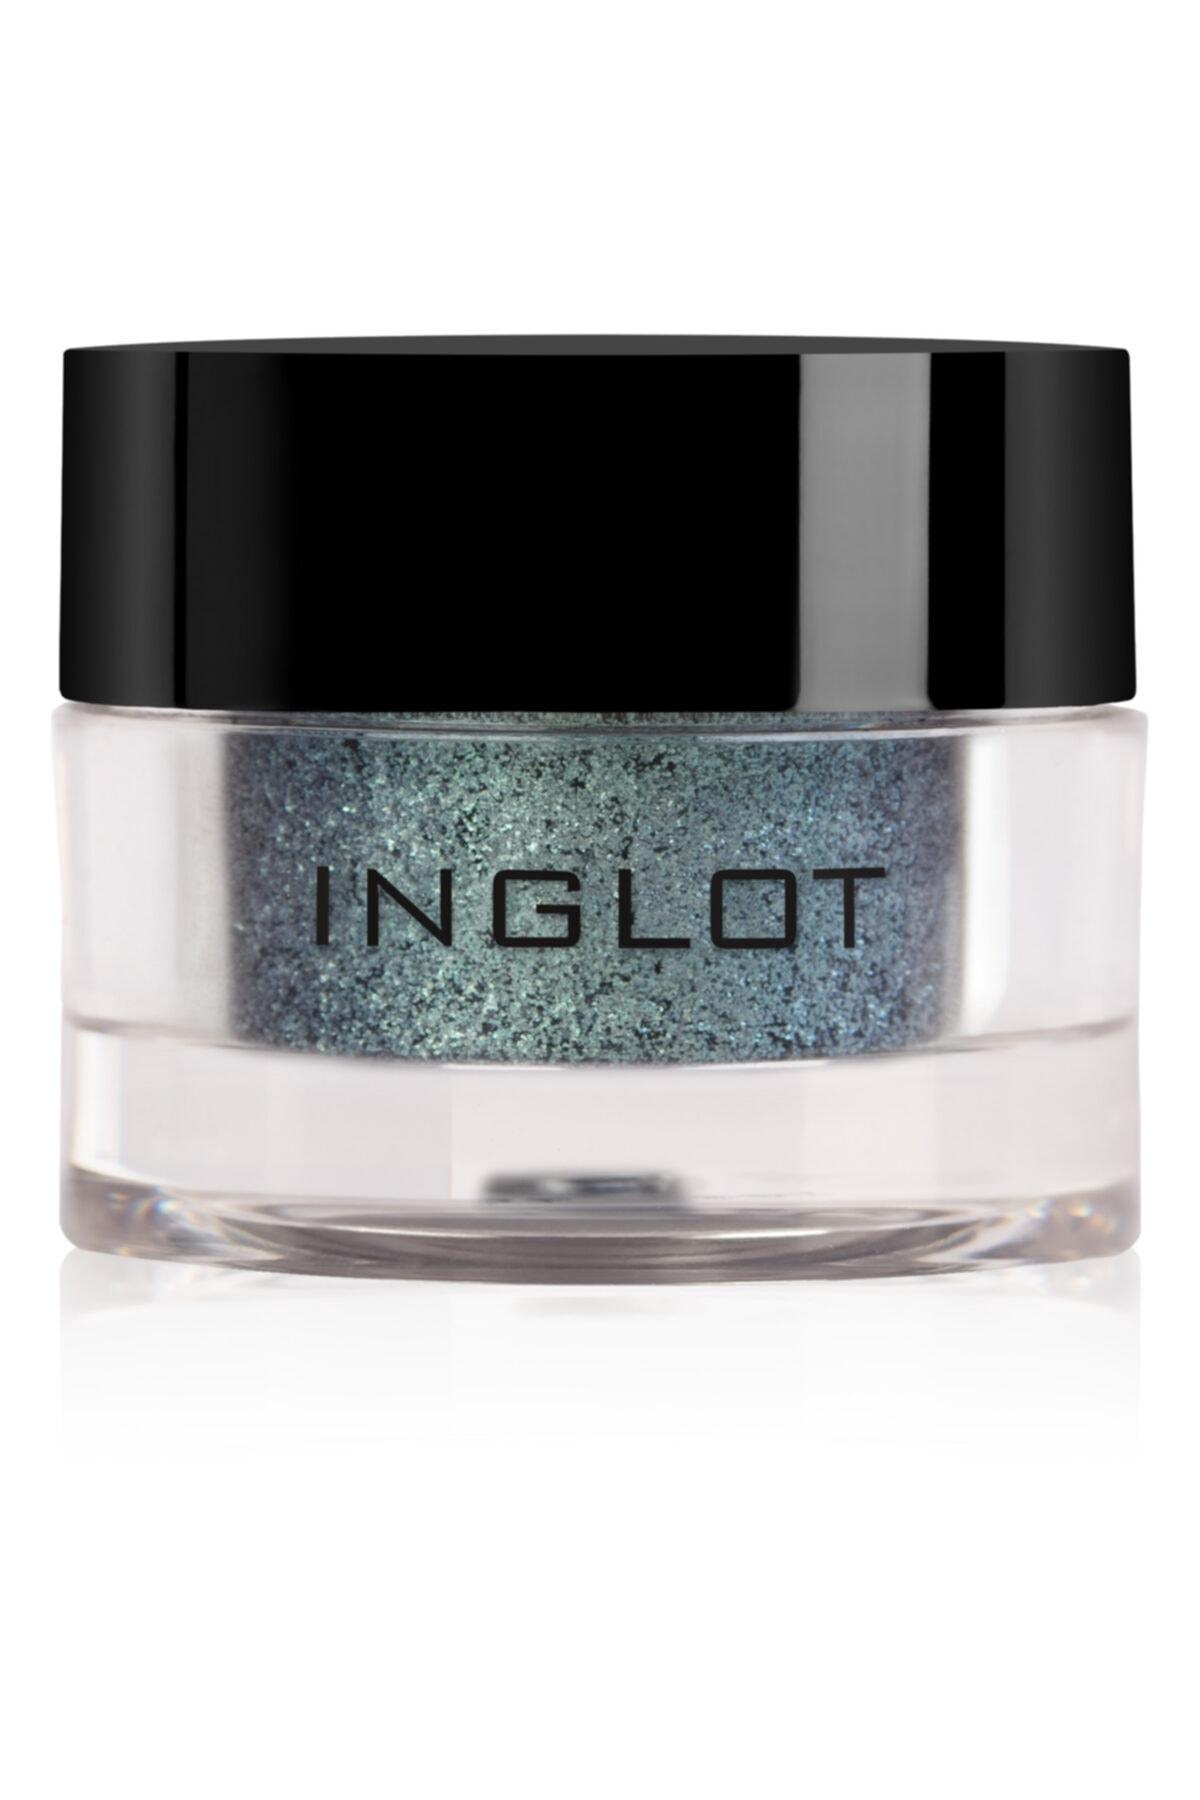 INGLOT Göz Farı-amc Pure Pigment Eye Shadow 117 1